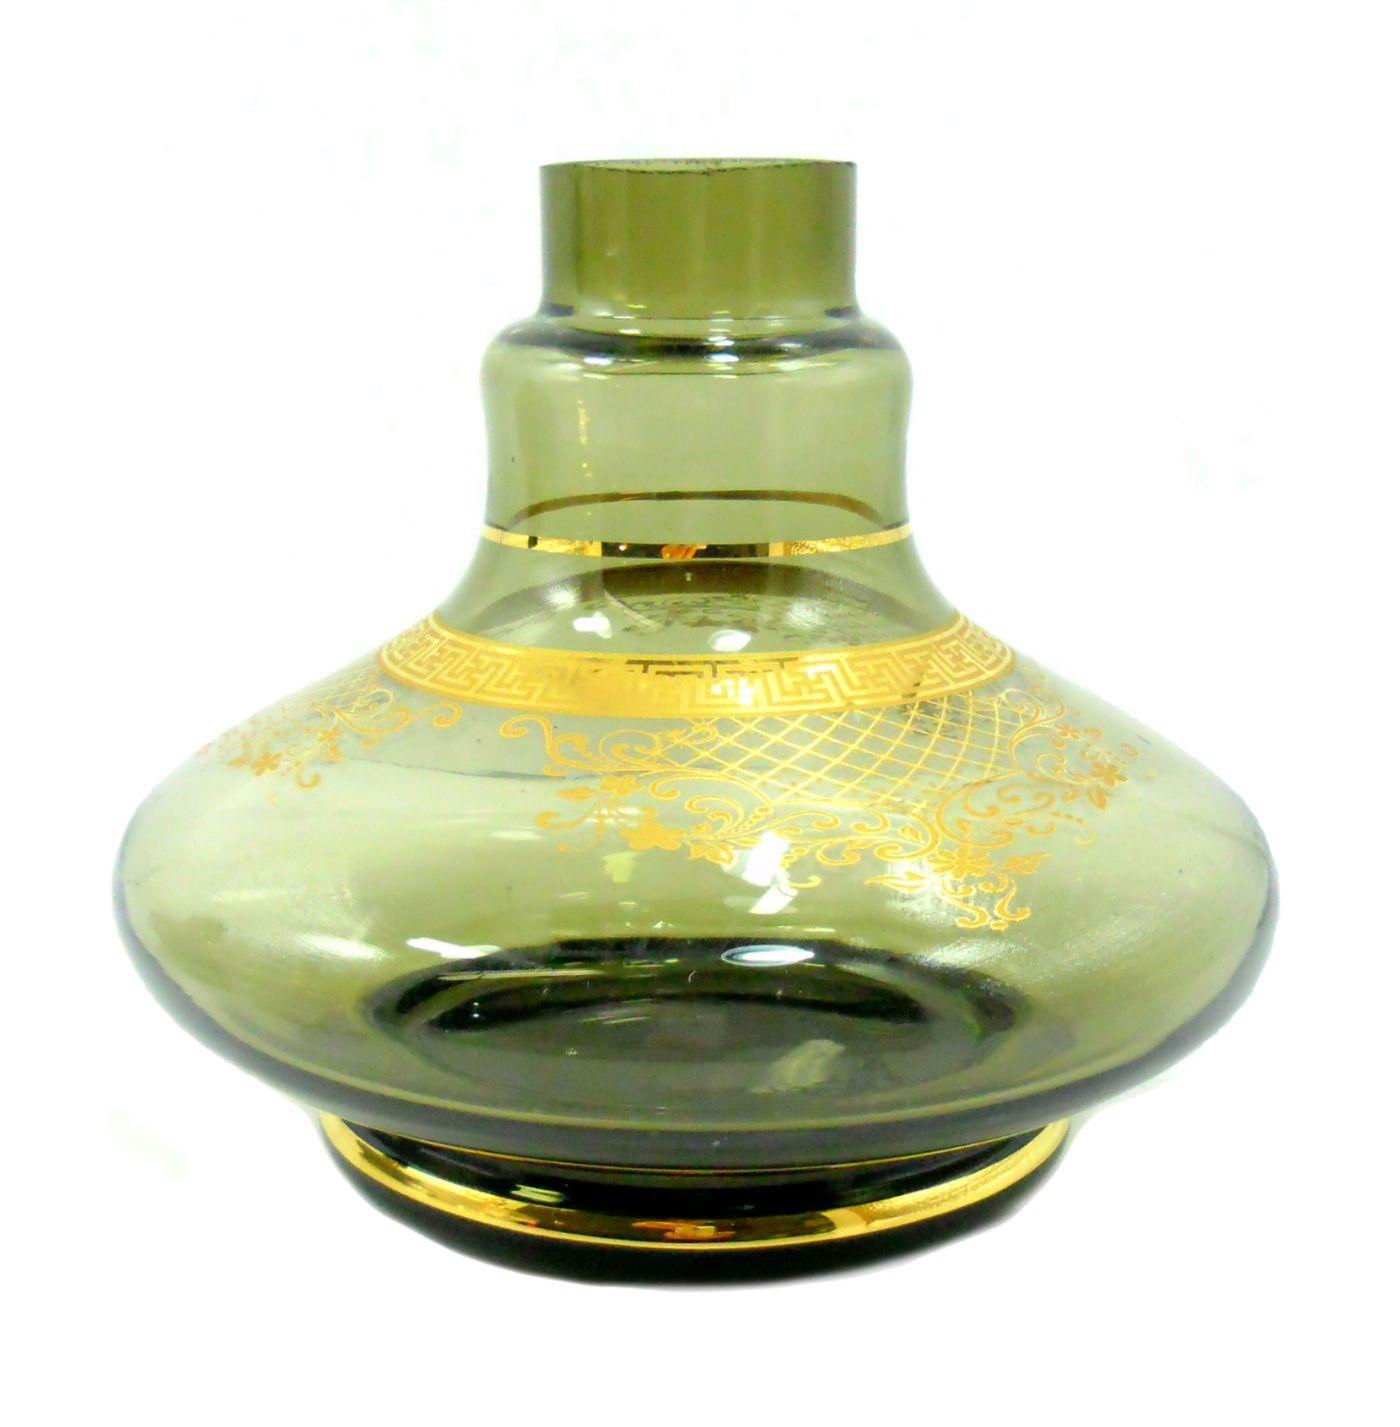 Vaso/base para narguile ALADIN PEQ(13,5cm) MD HOOKAH, listras e desenhos dourados. 3,9cm diâm. bocal